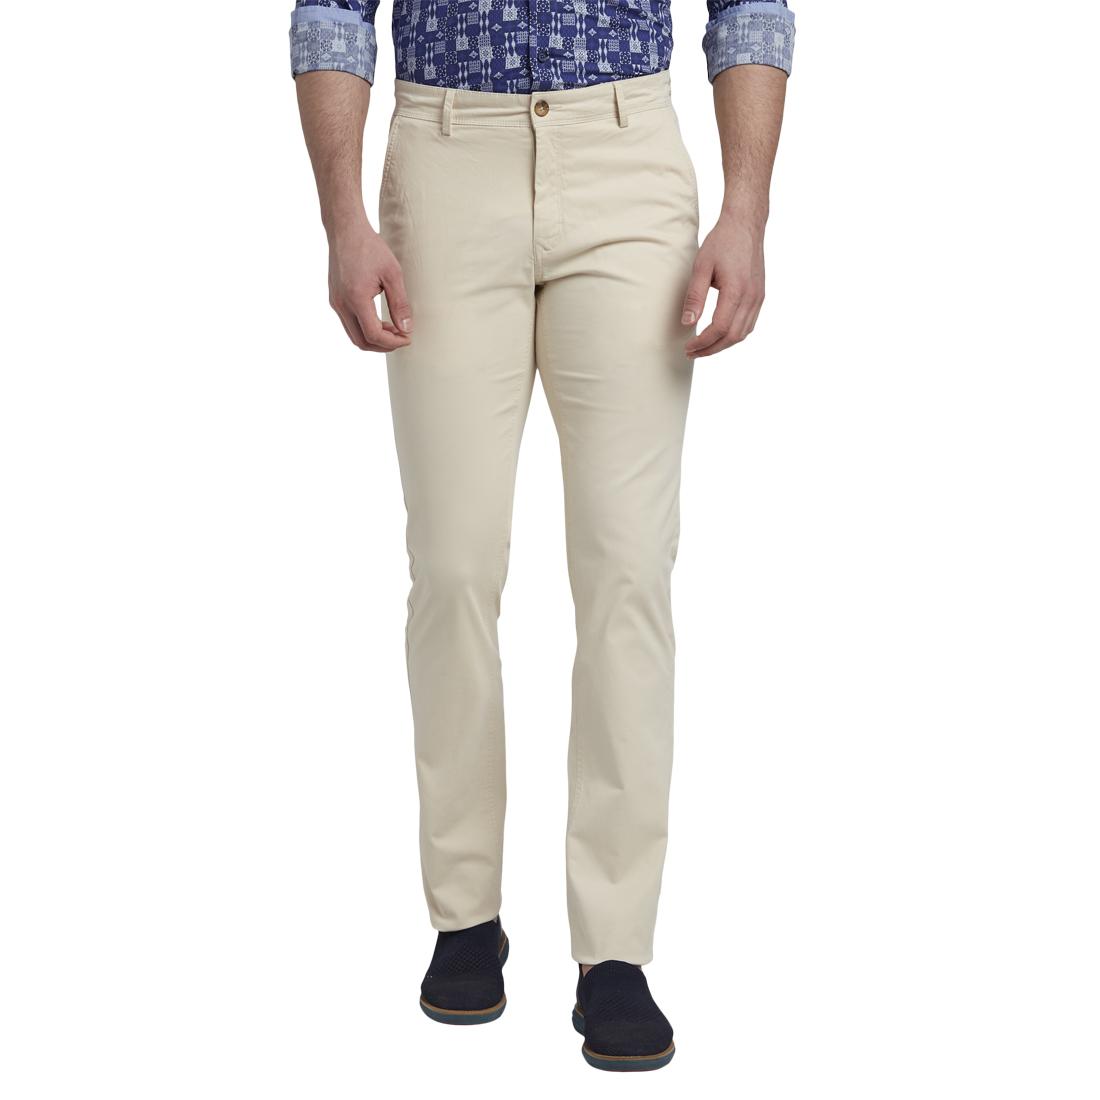 ColorPlus | ColorPlus Light Fawn Tailored Fit Trouser